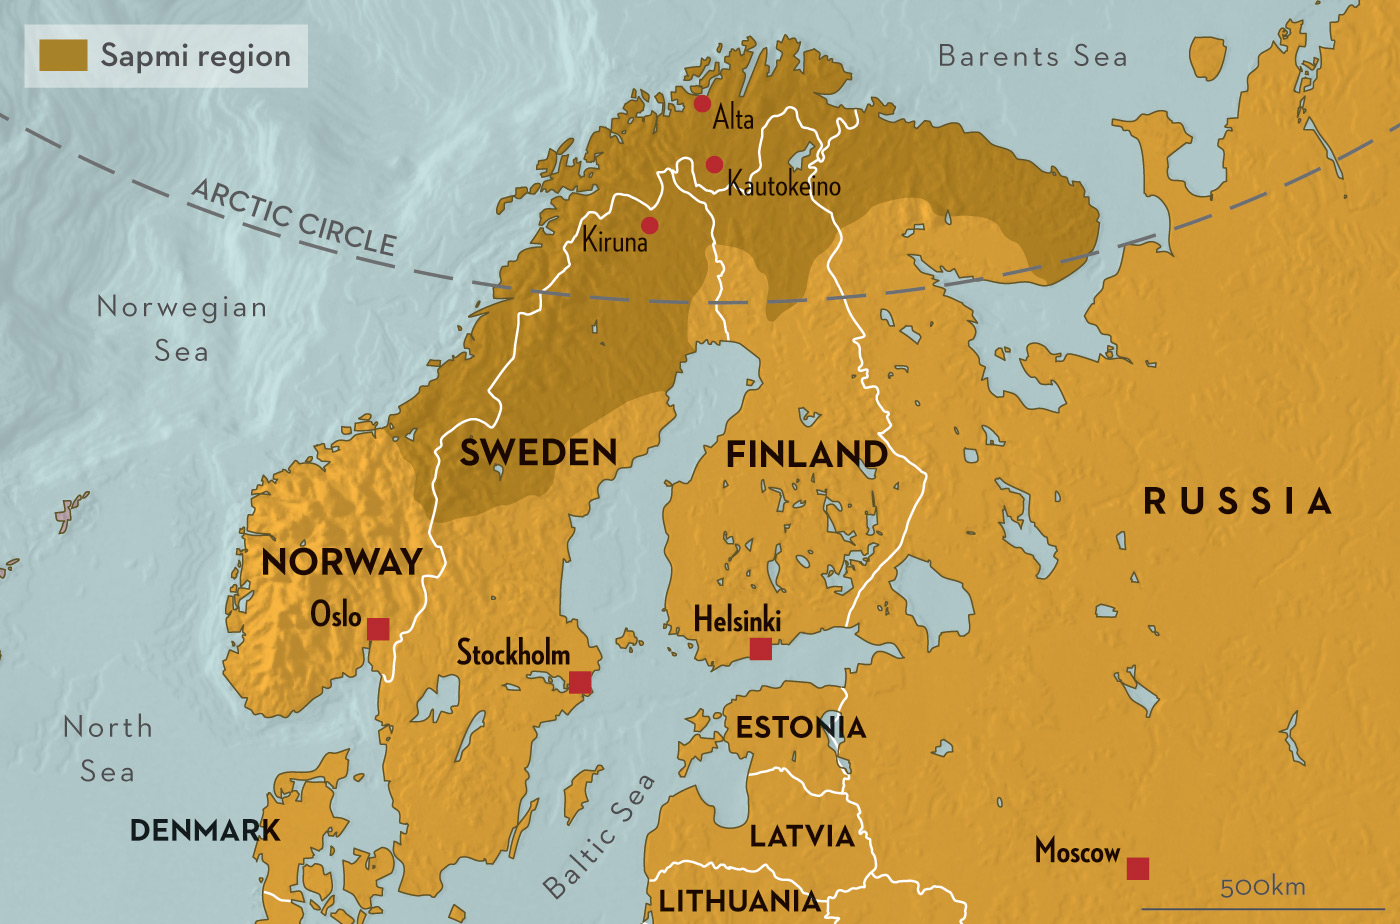 лапландия где она находится фото на карте